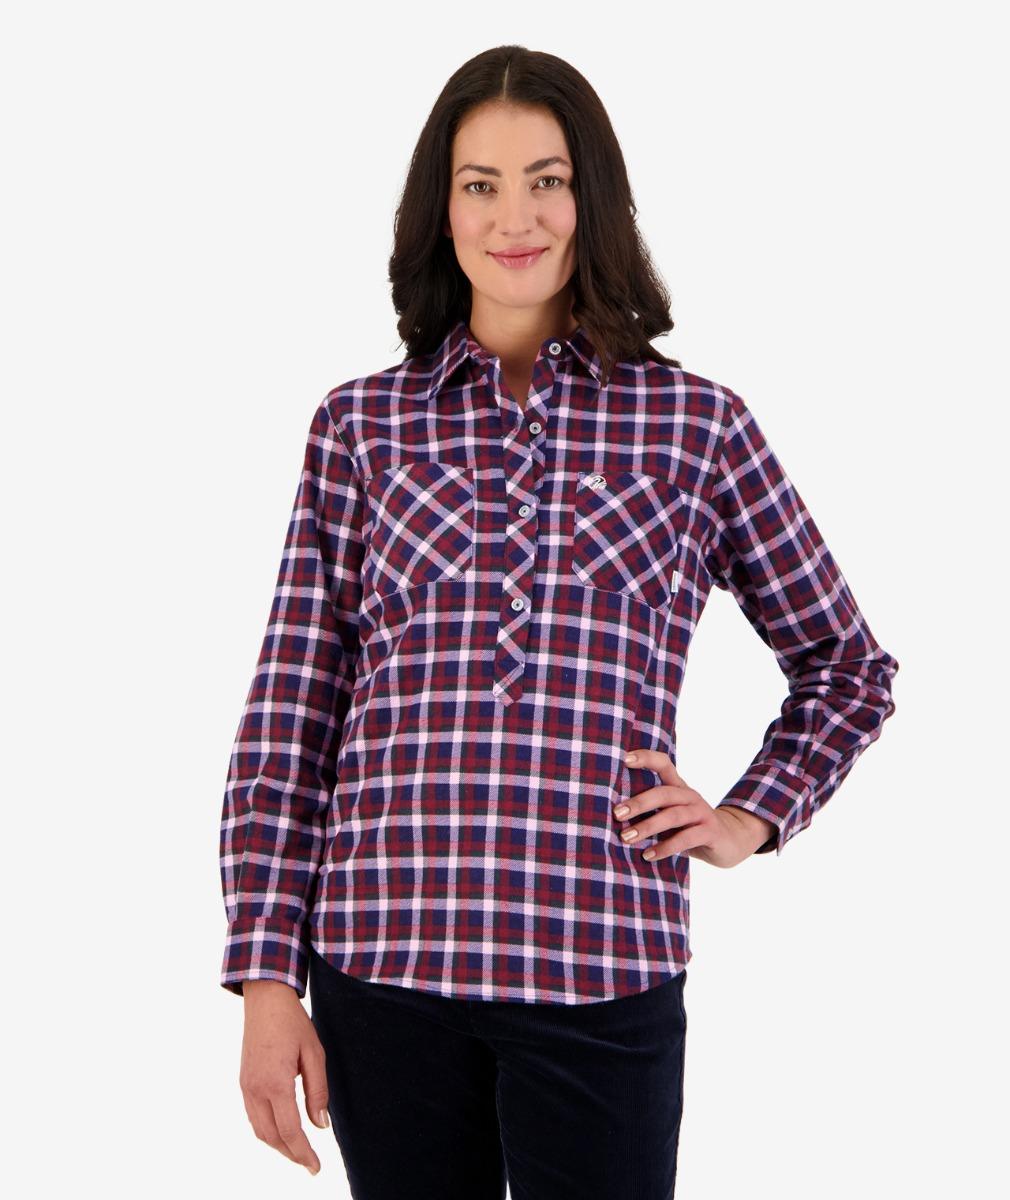 Swanndri Women's Egmont Long Sleeve Cotton Shirt Twin Pack in Pink/Navy